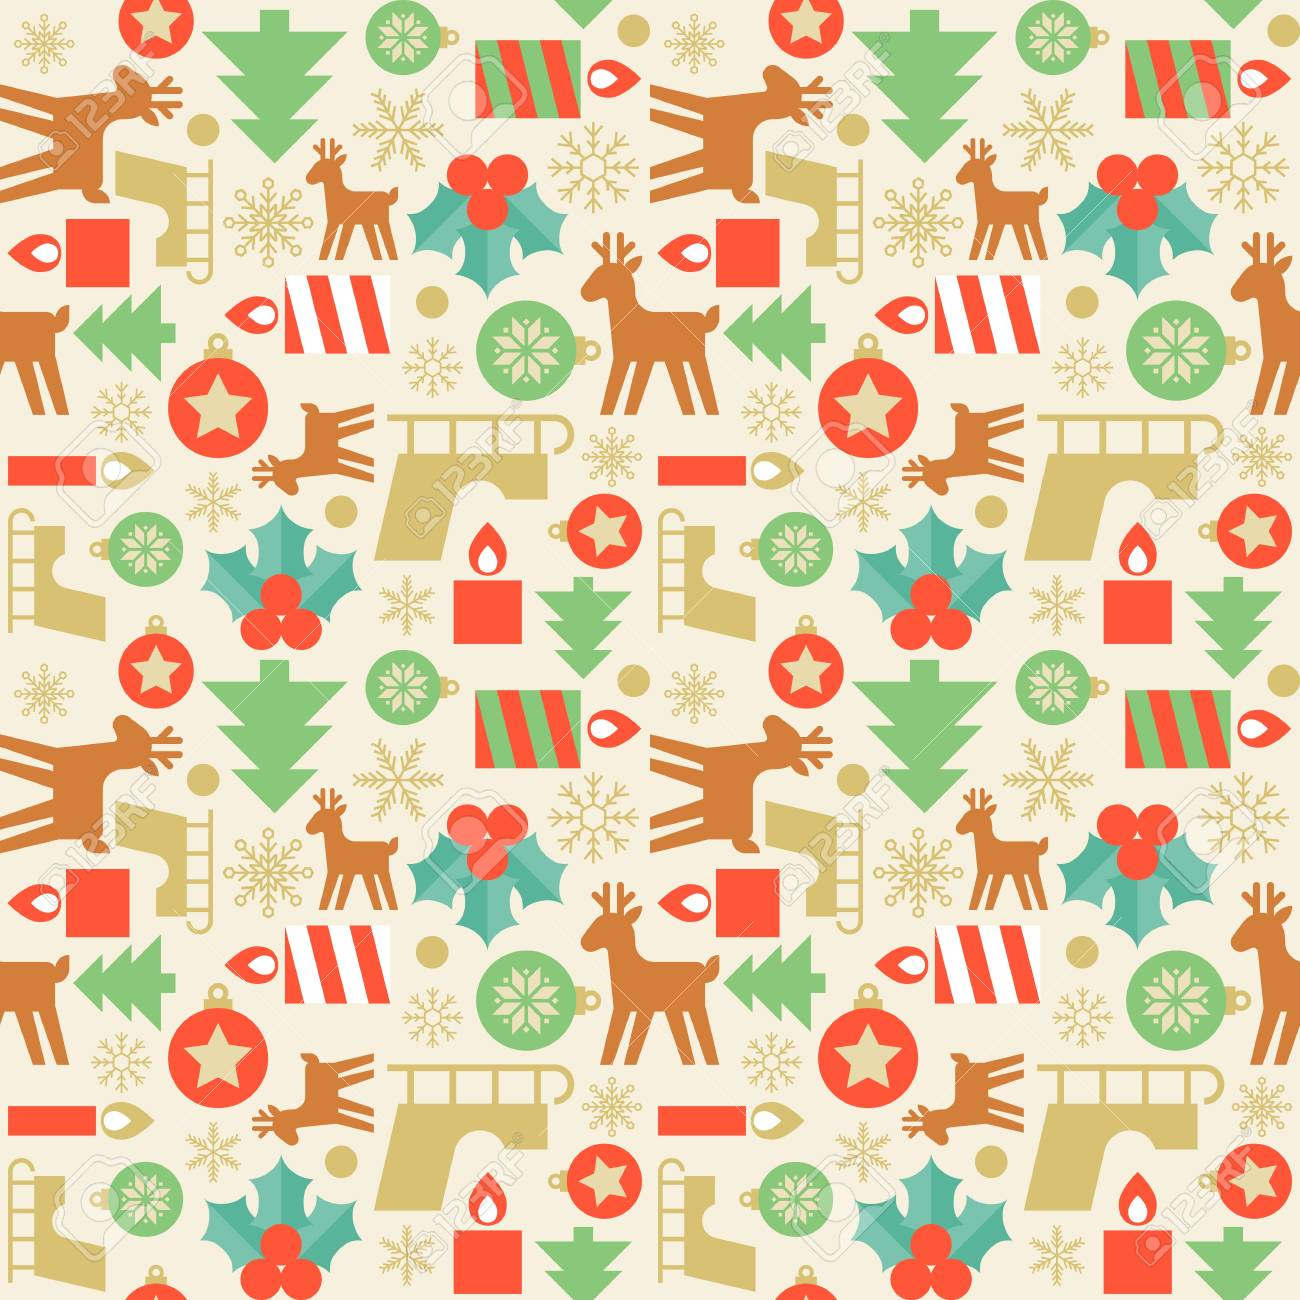 Seamless Pattern Wallpaper Of Christmas Tree Candle Reindeer Sleigh Snowflake